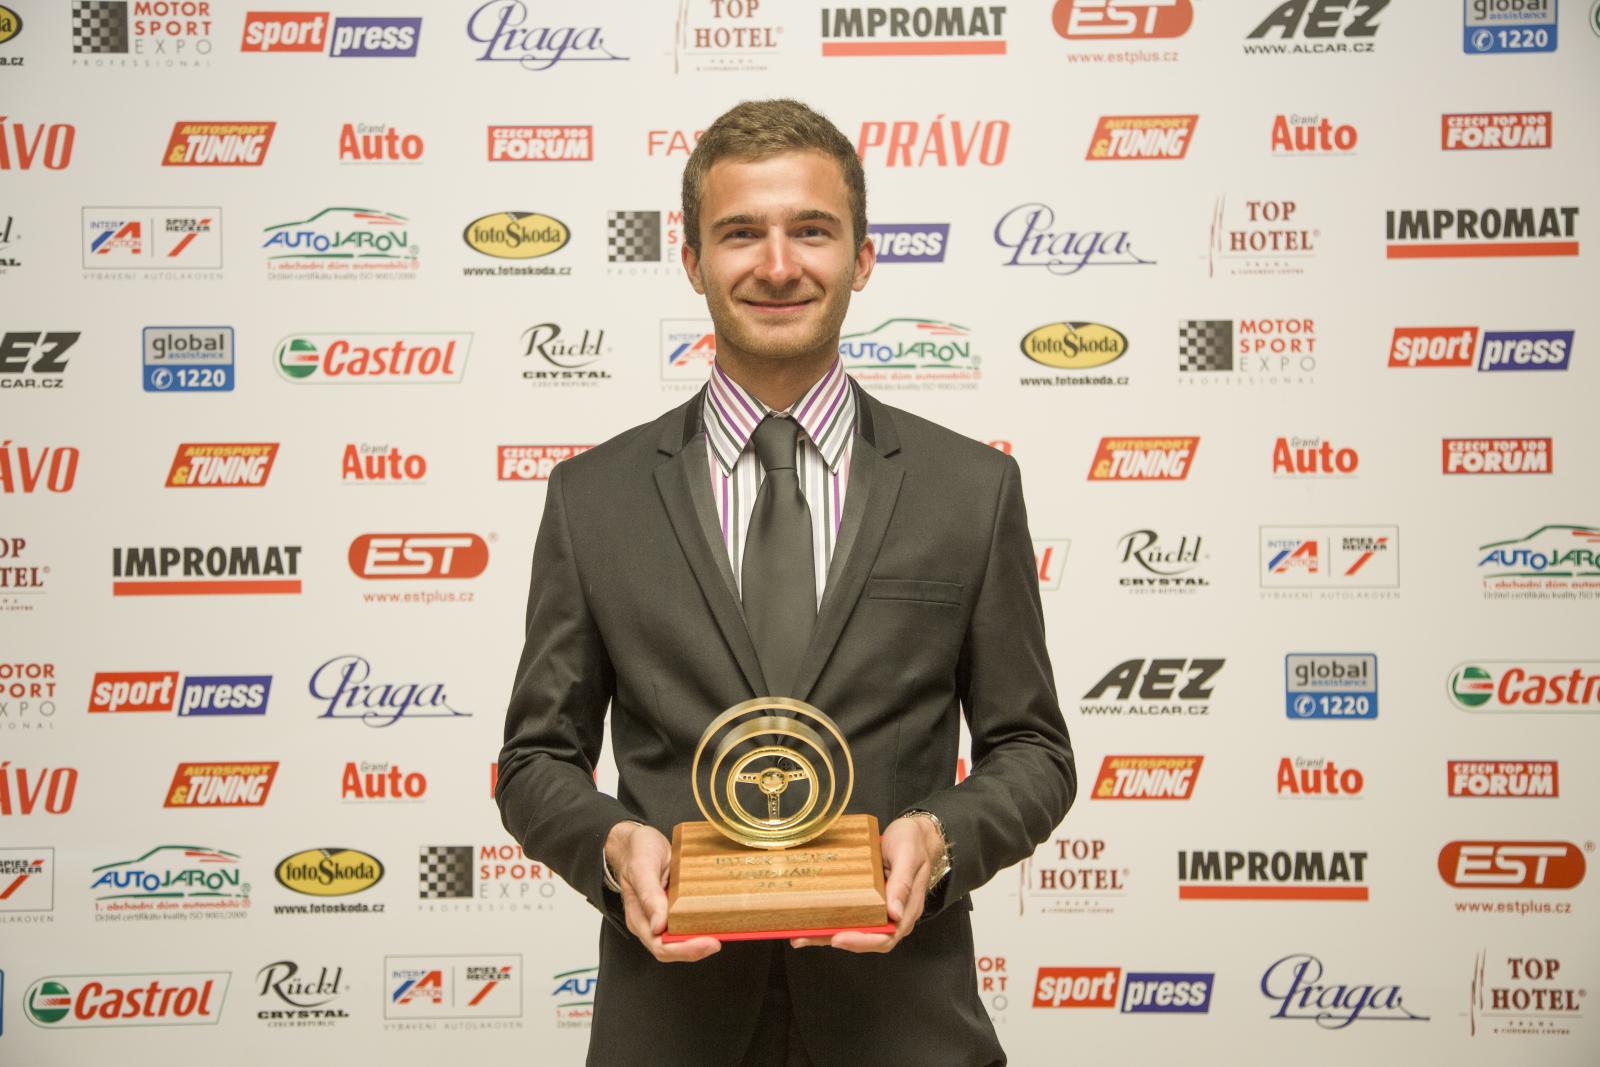 Patrik Hájek races to the TOP!!!